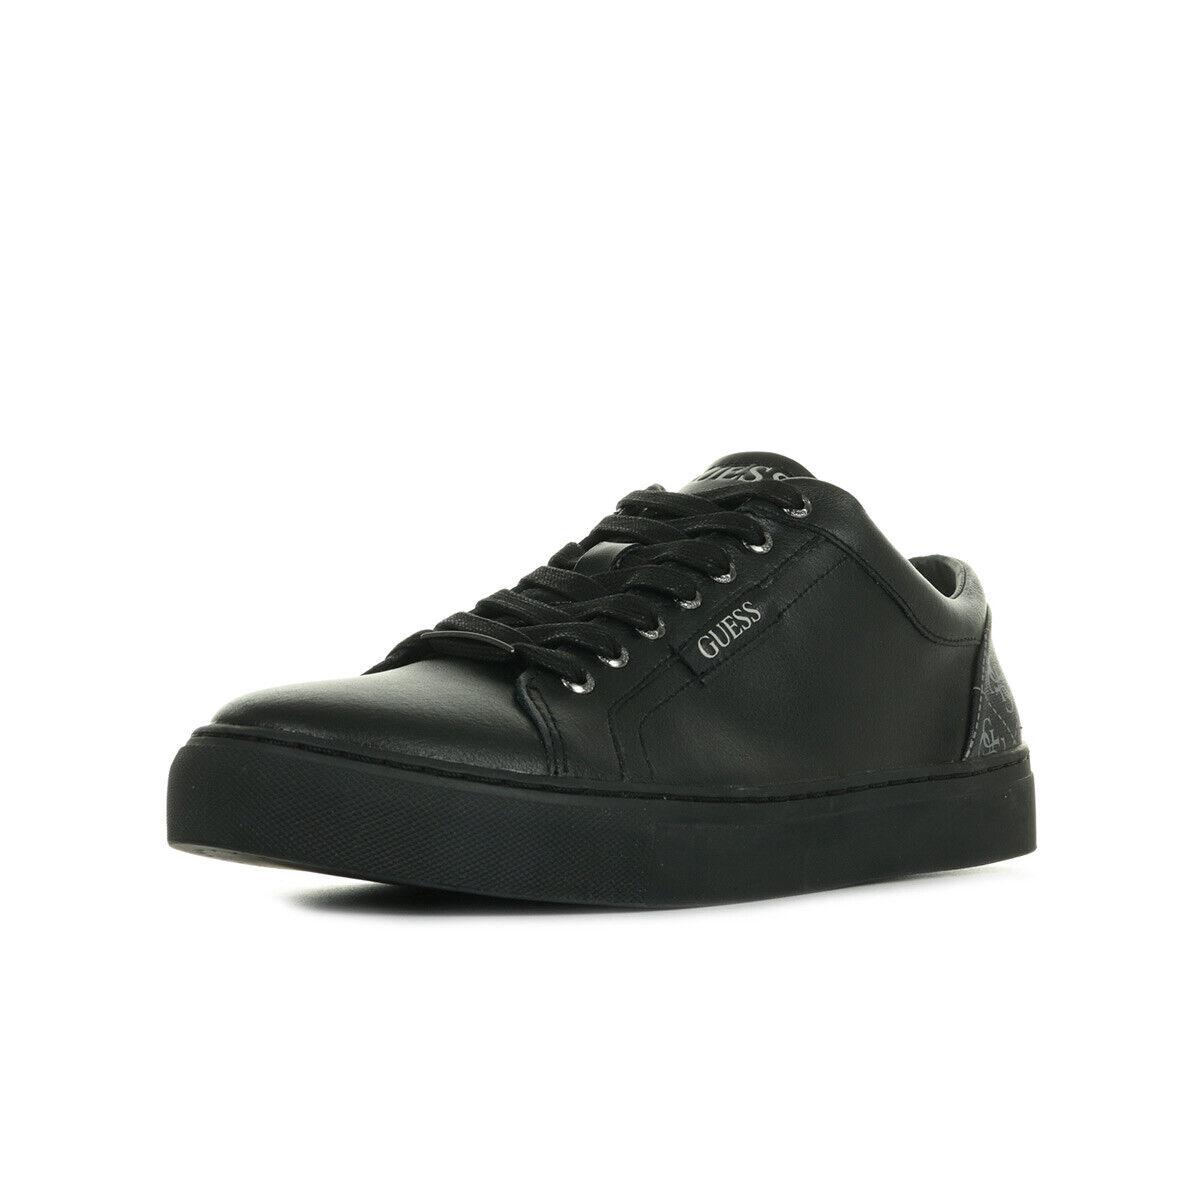 Schuhe Guess Herren Luiss schwarz